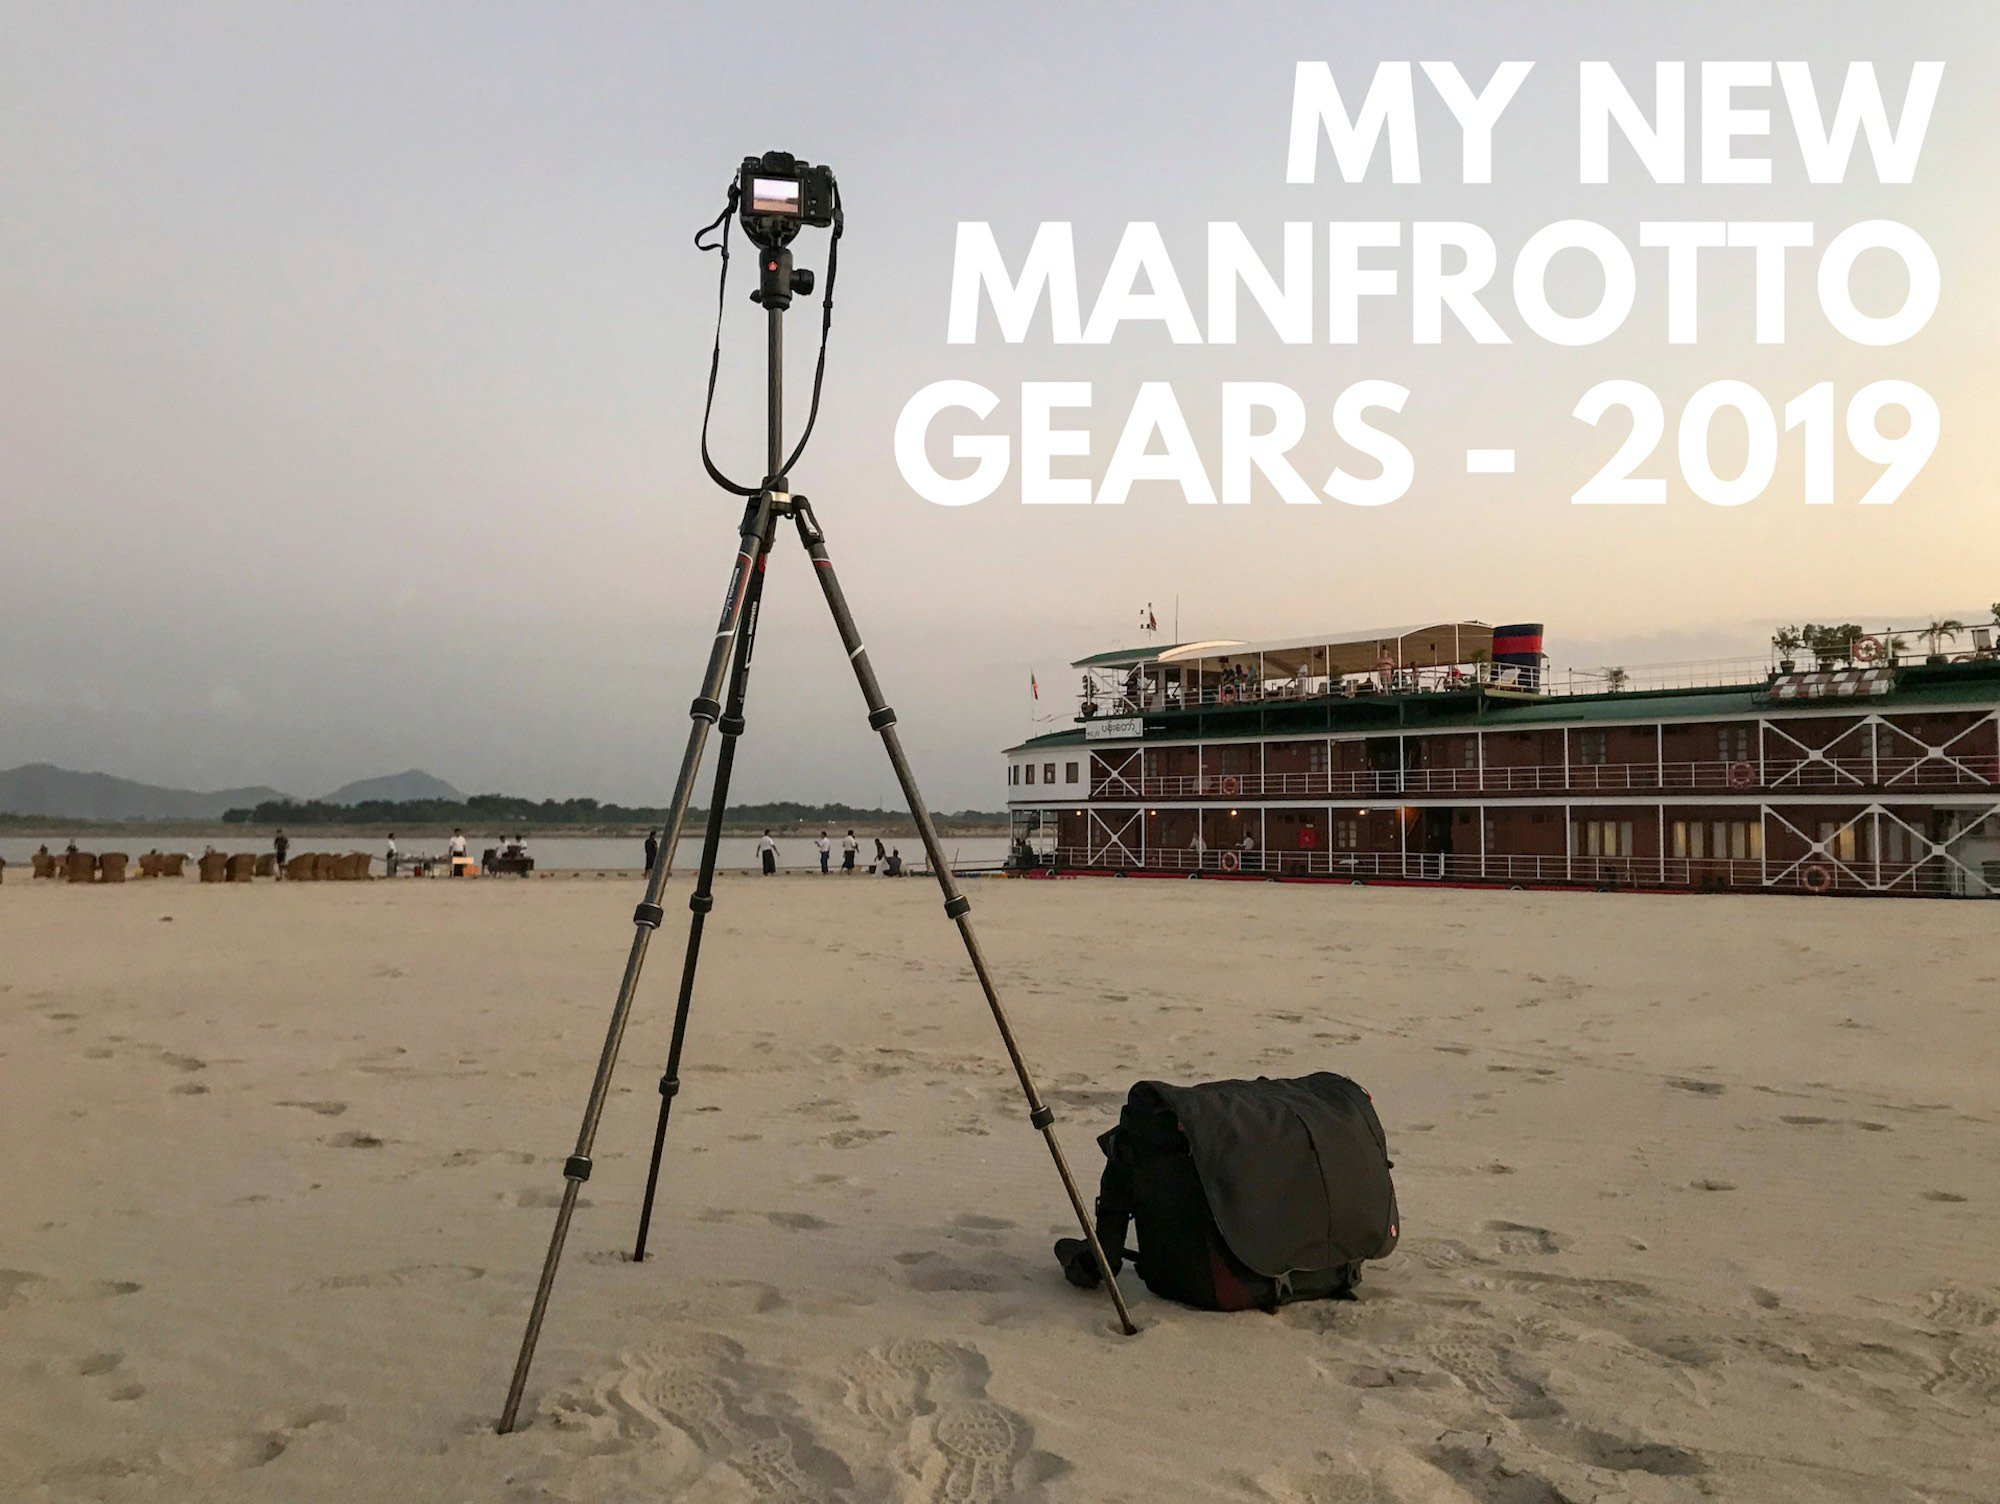 Manfrotto gears jose jeuland photographer tripod camera bag